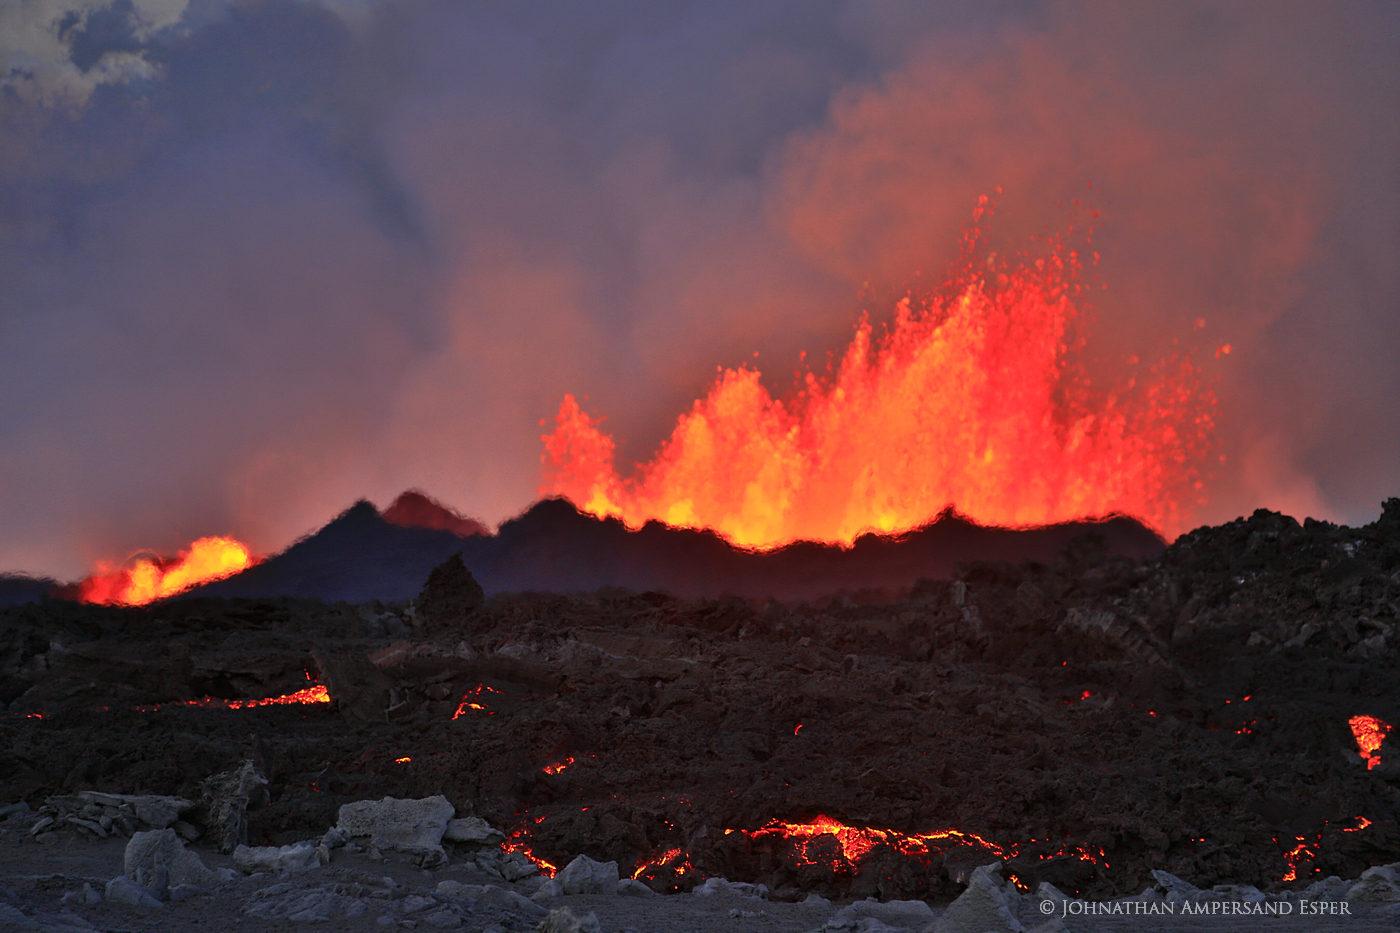 The Holuhraun eruption in 2014, Iceland, at dusk